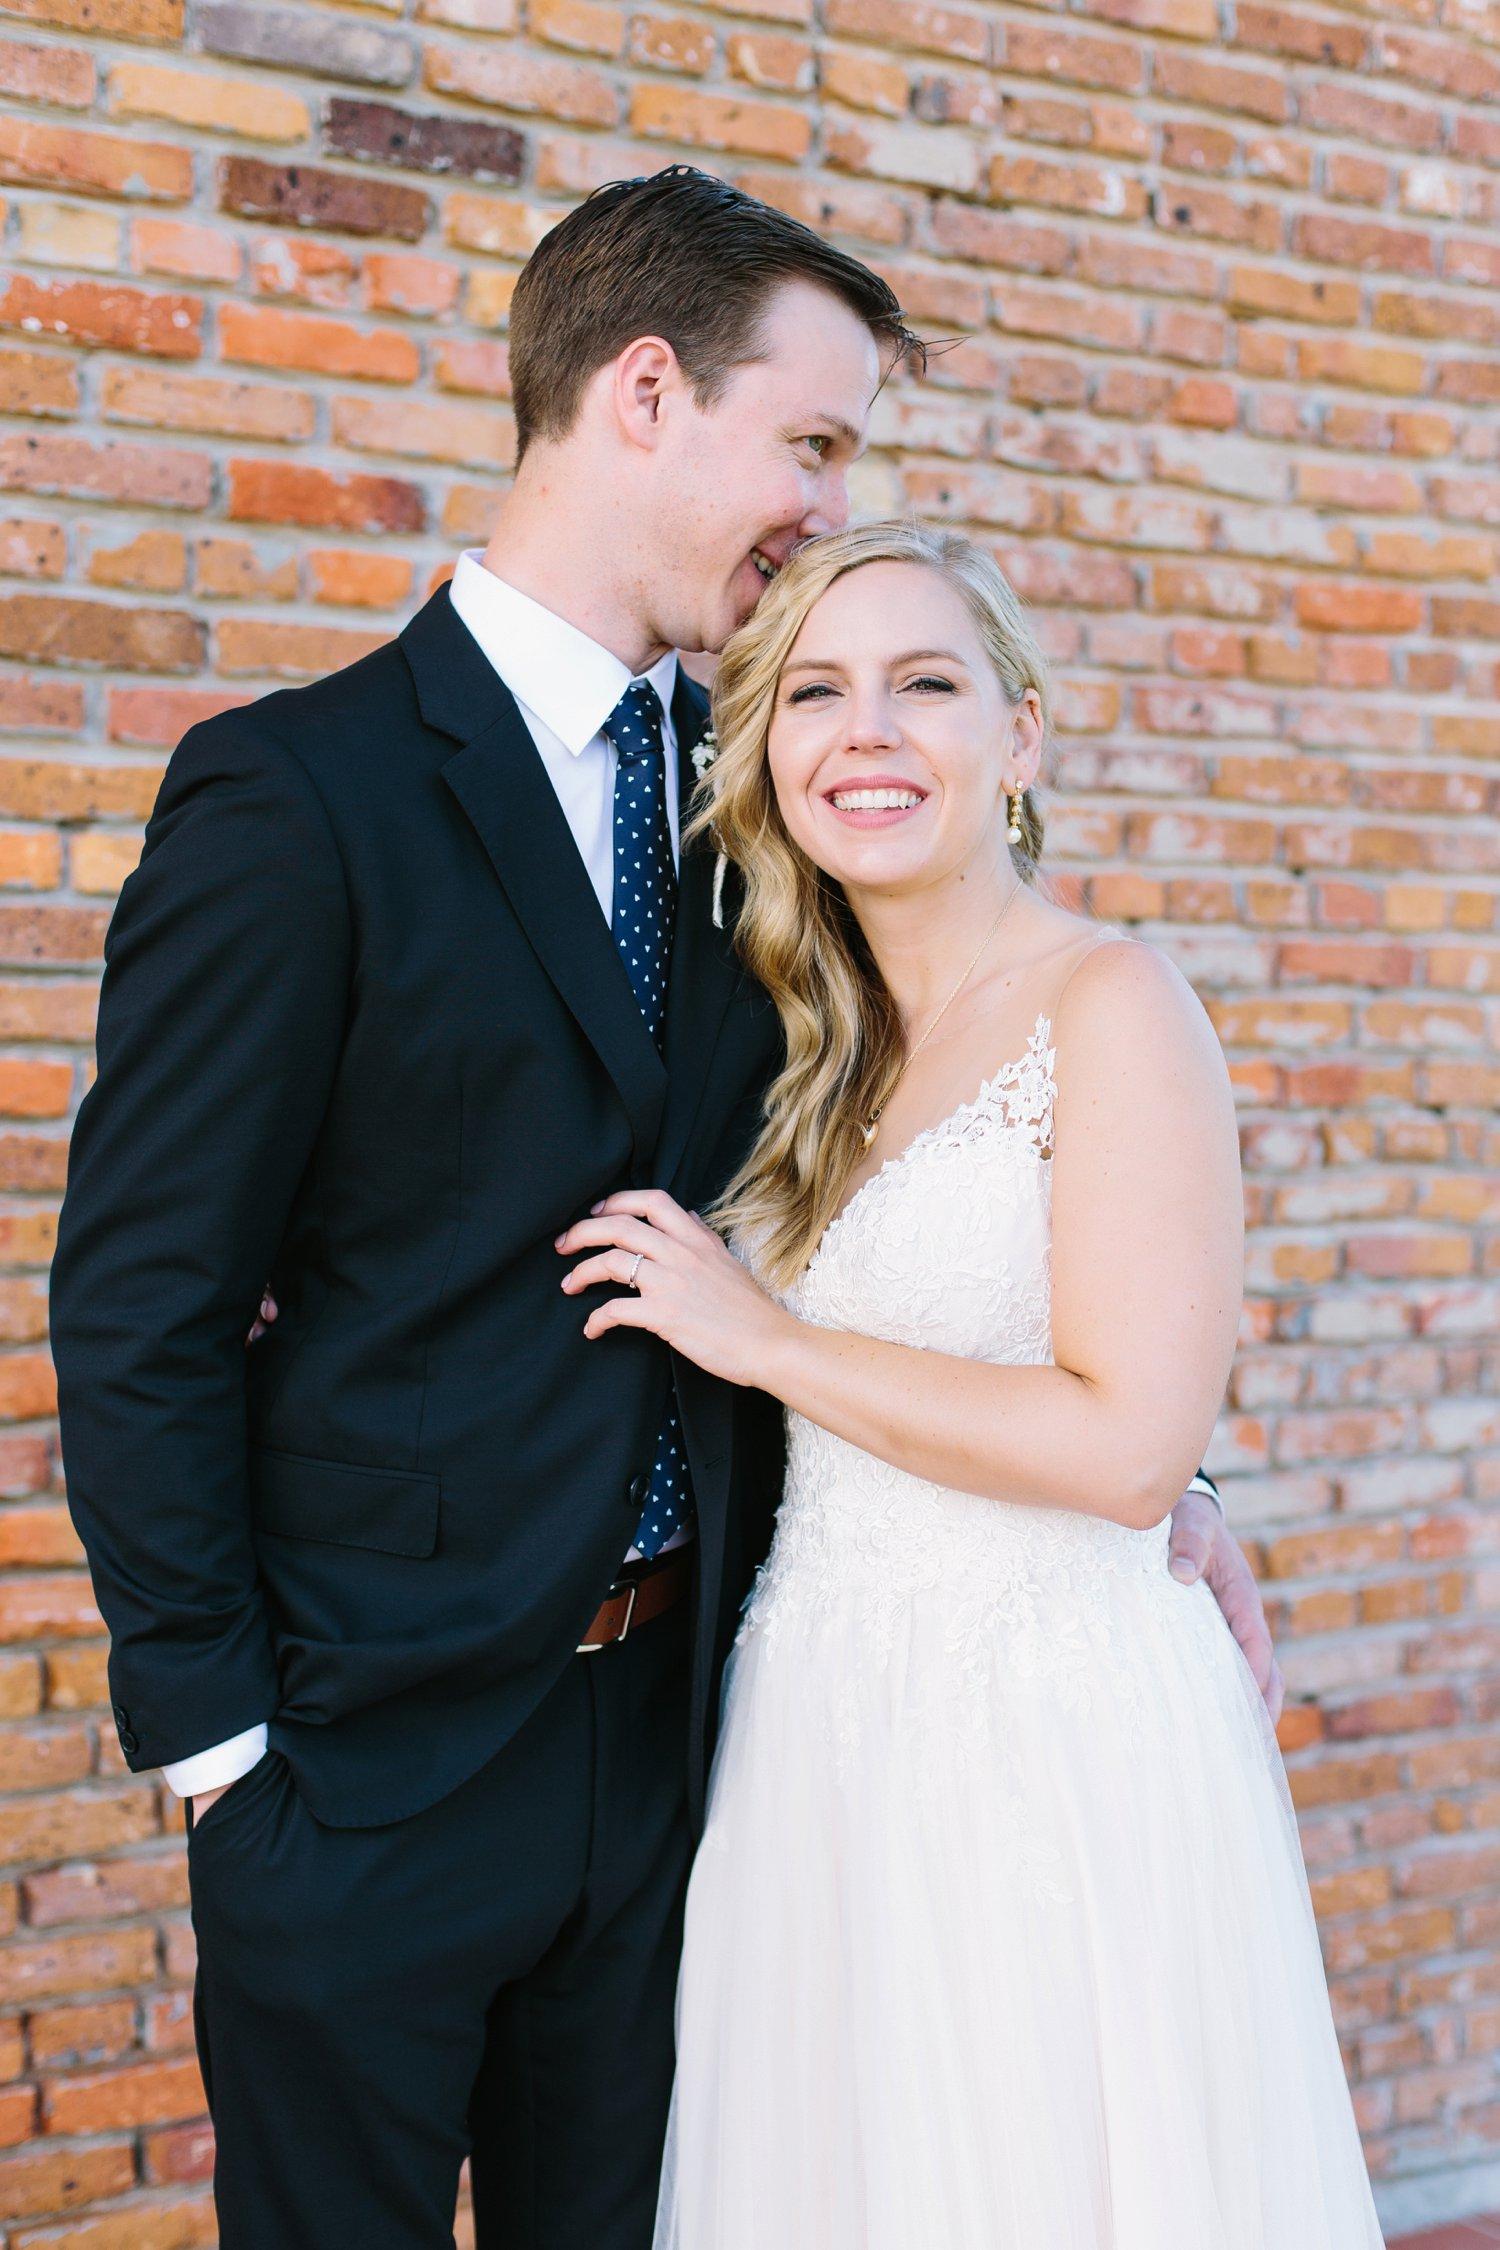 Lindsey_A_Miller_Photography_wedding_southport_community_building_bubbly_events_north_carolina_coasta_cannon_nautical_historic_044.jpg